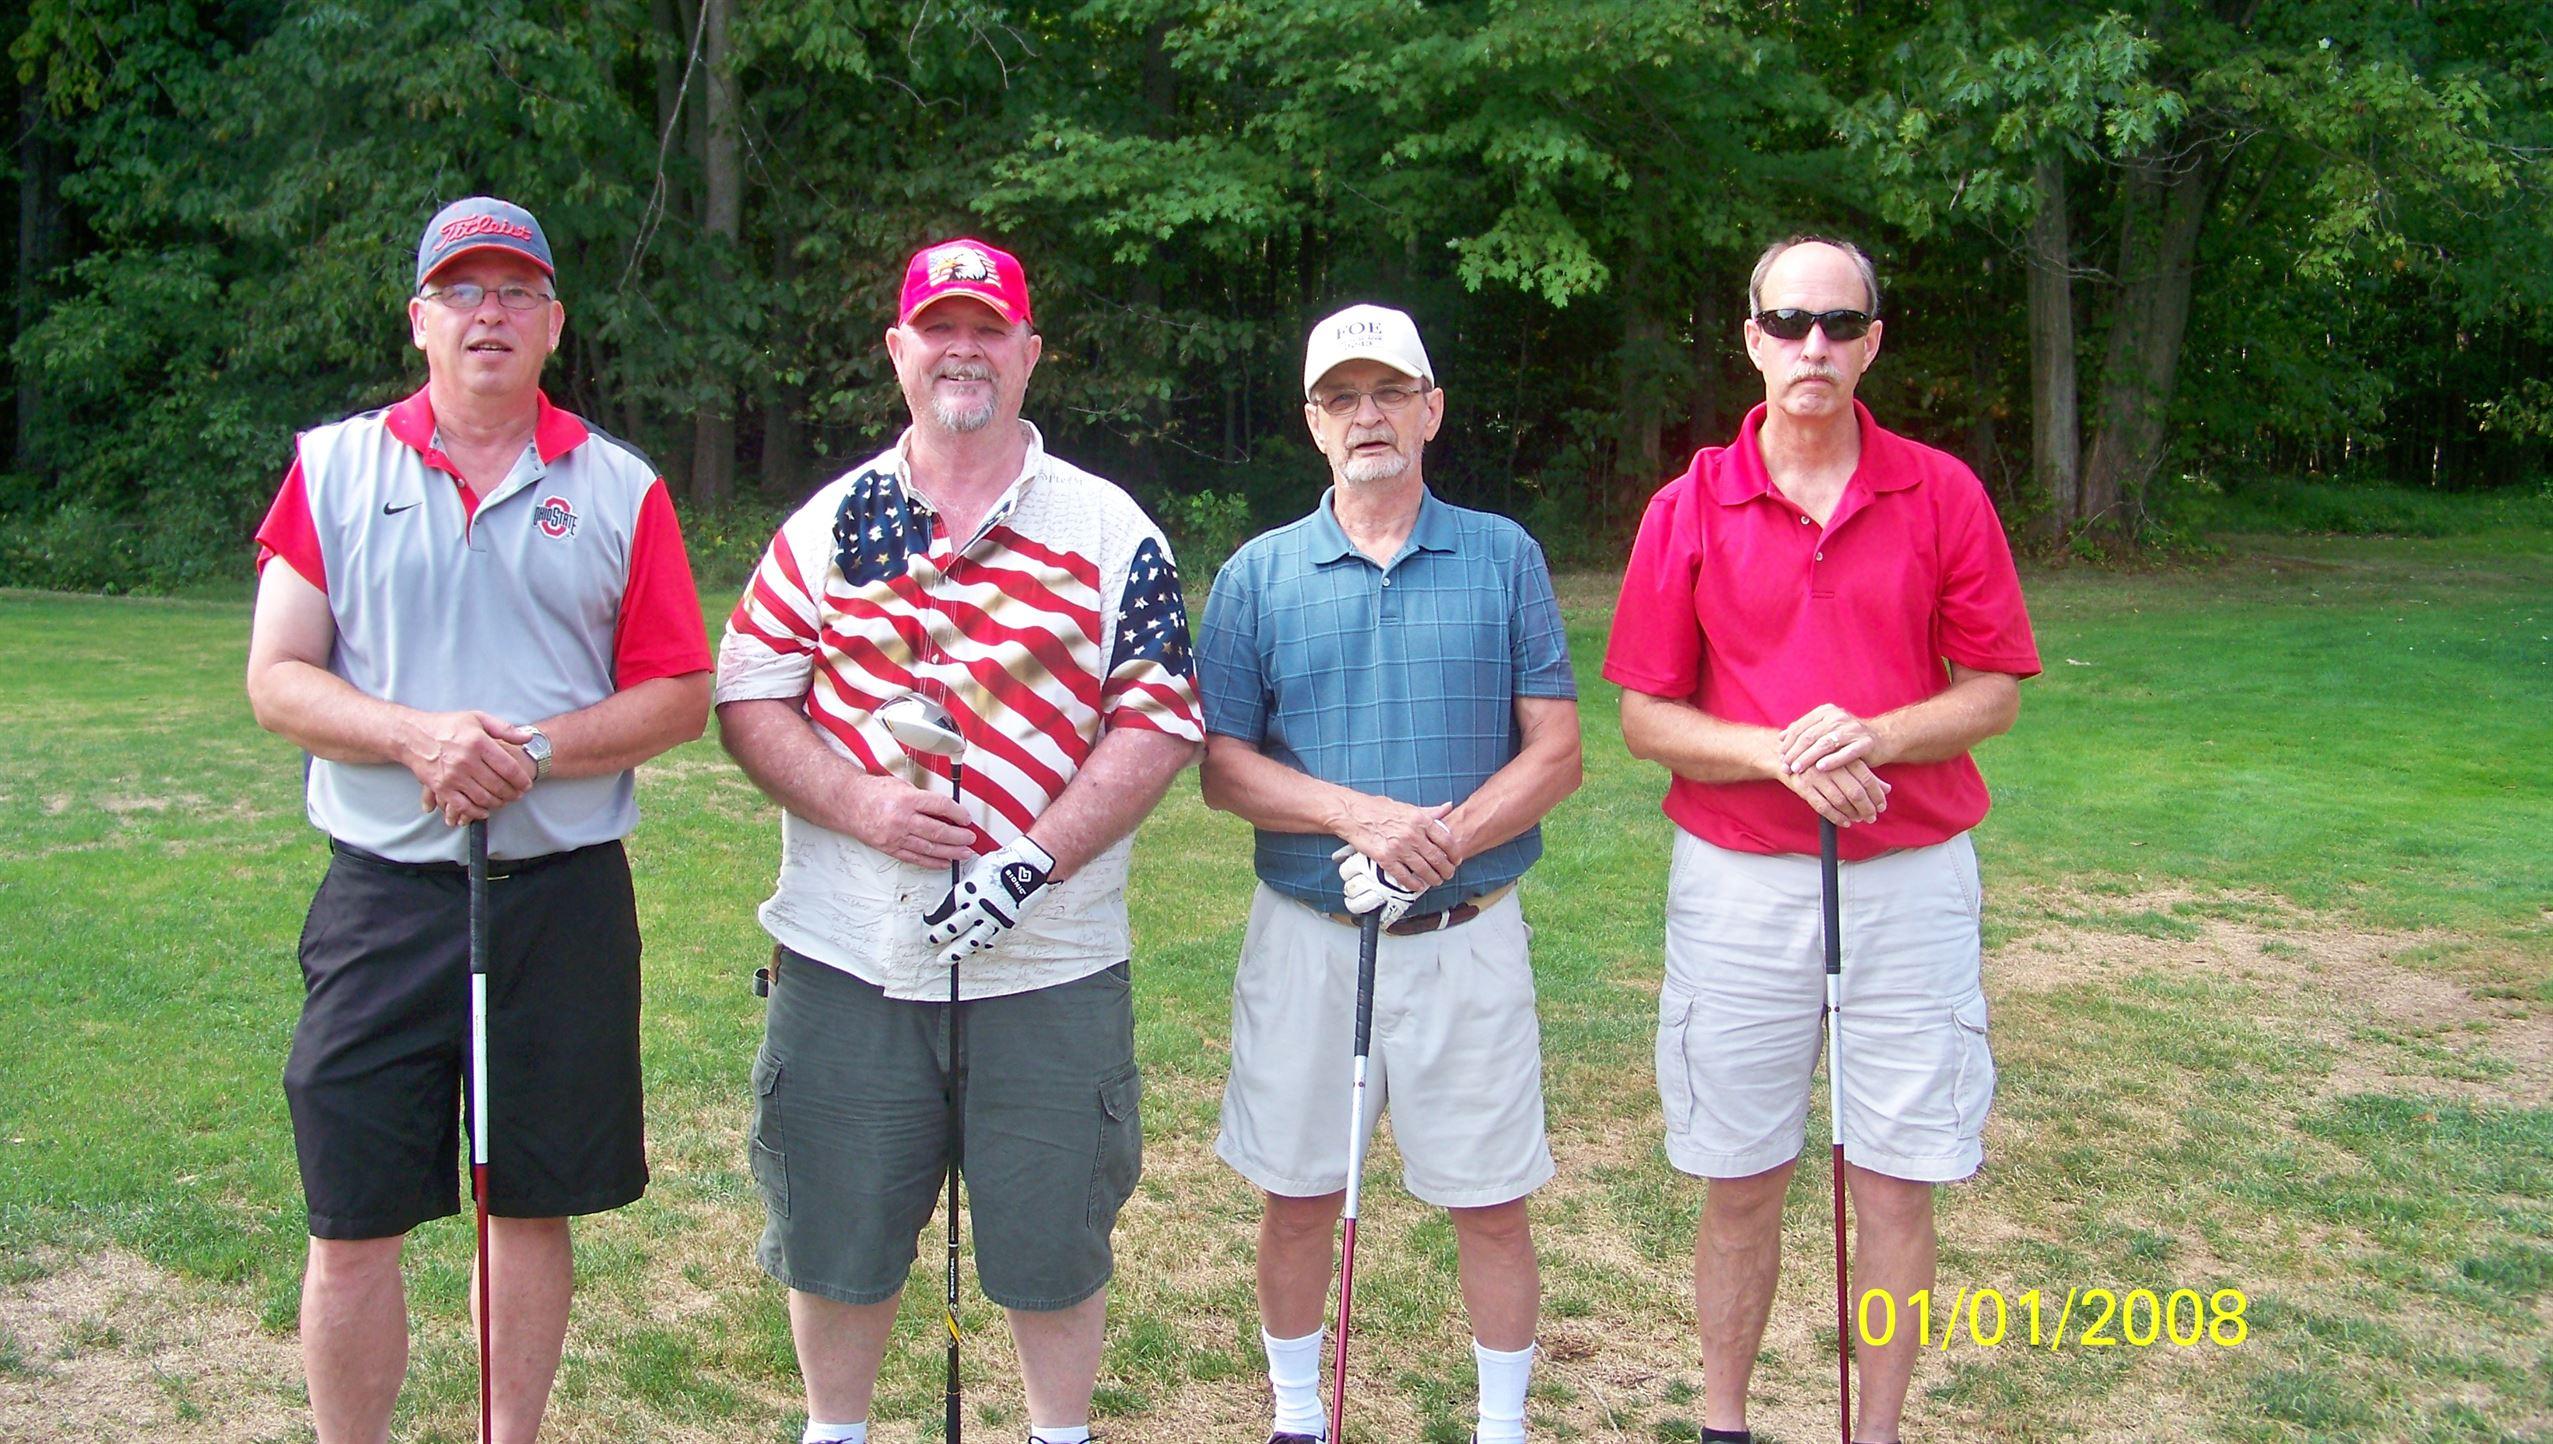 Doug Bright, Lanny Swiger, Dick Goff, Randy Goff